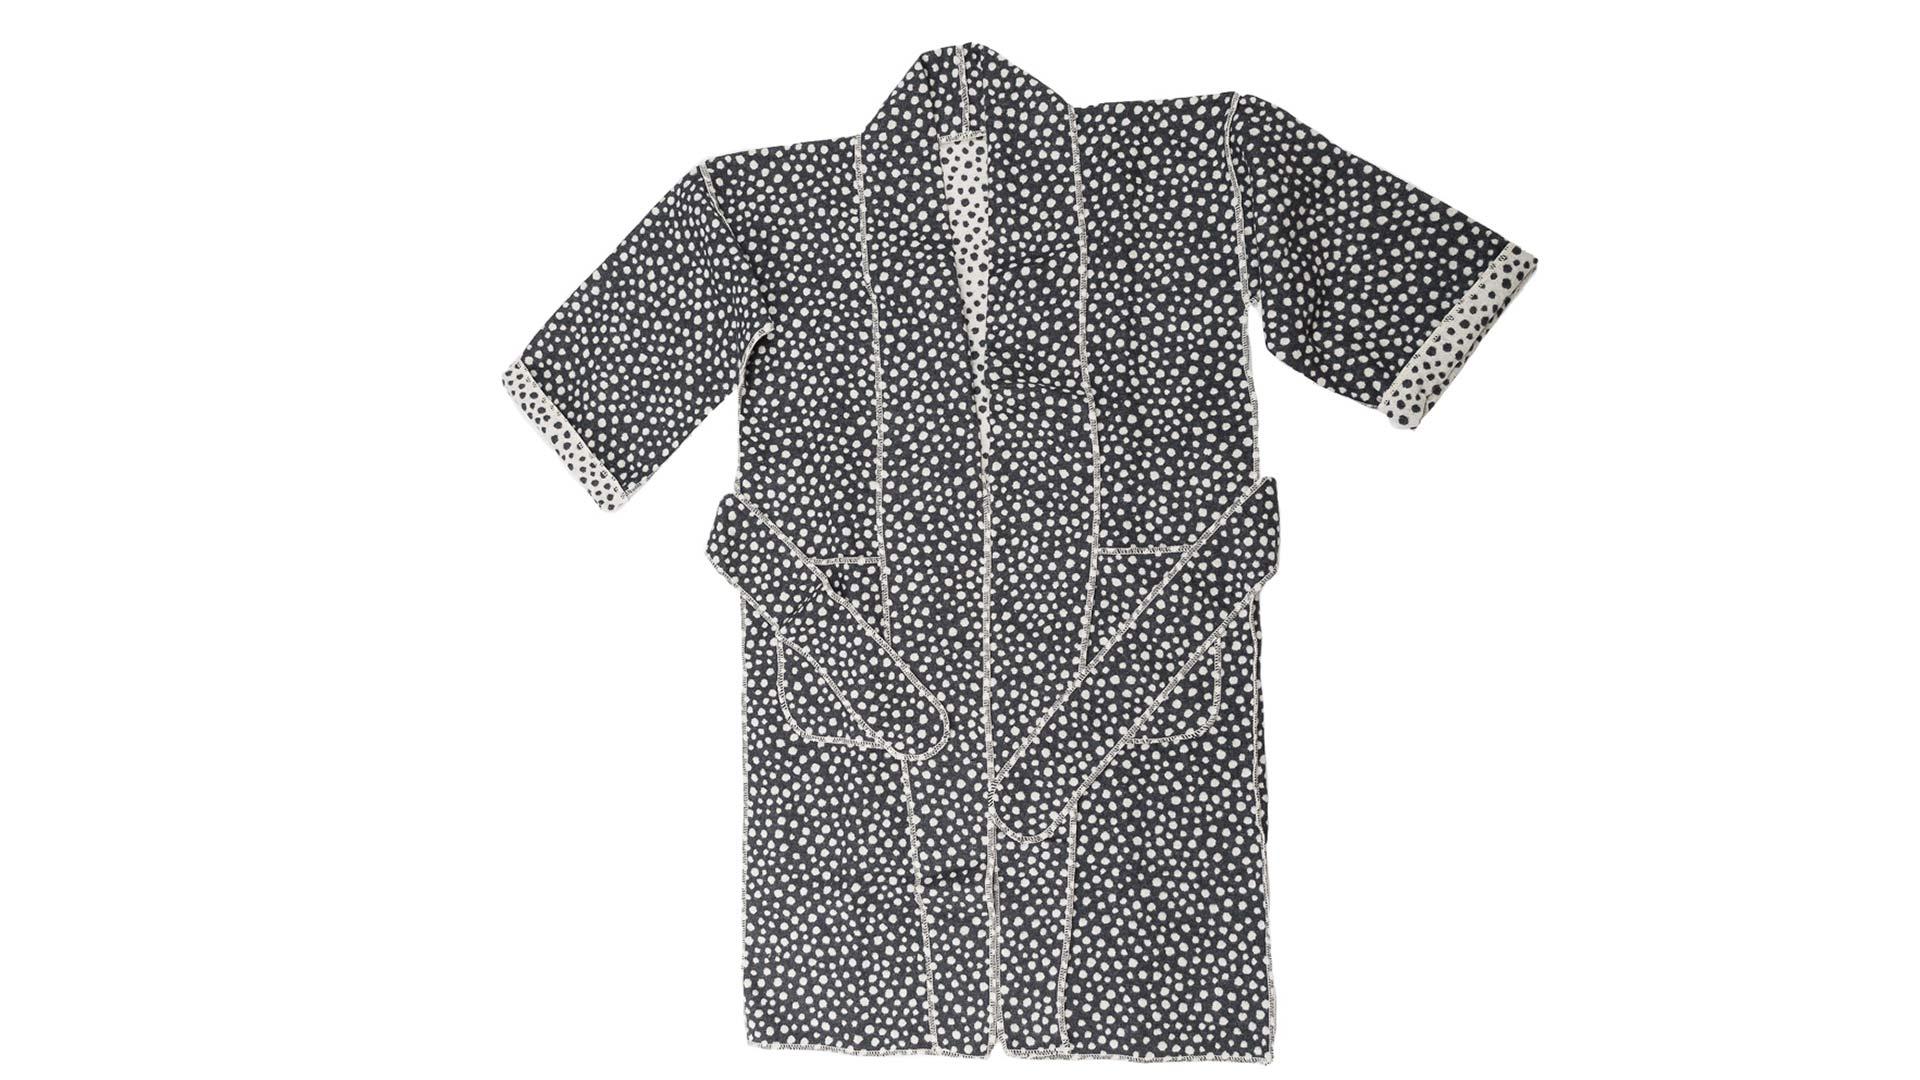 kimono-robe-dark-grey-spot